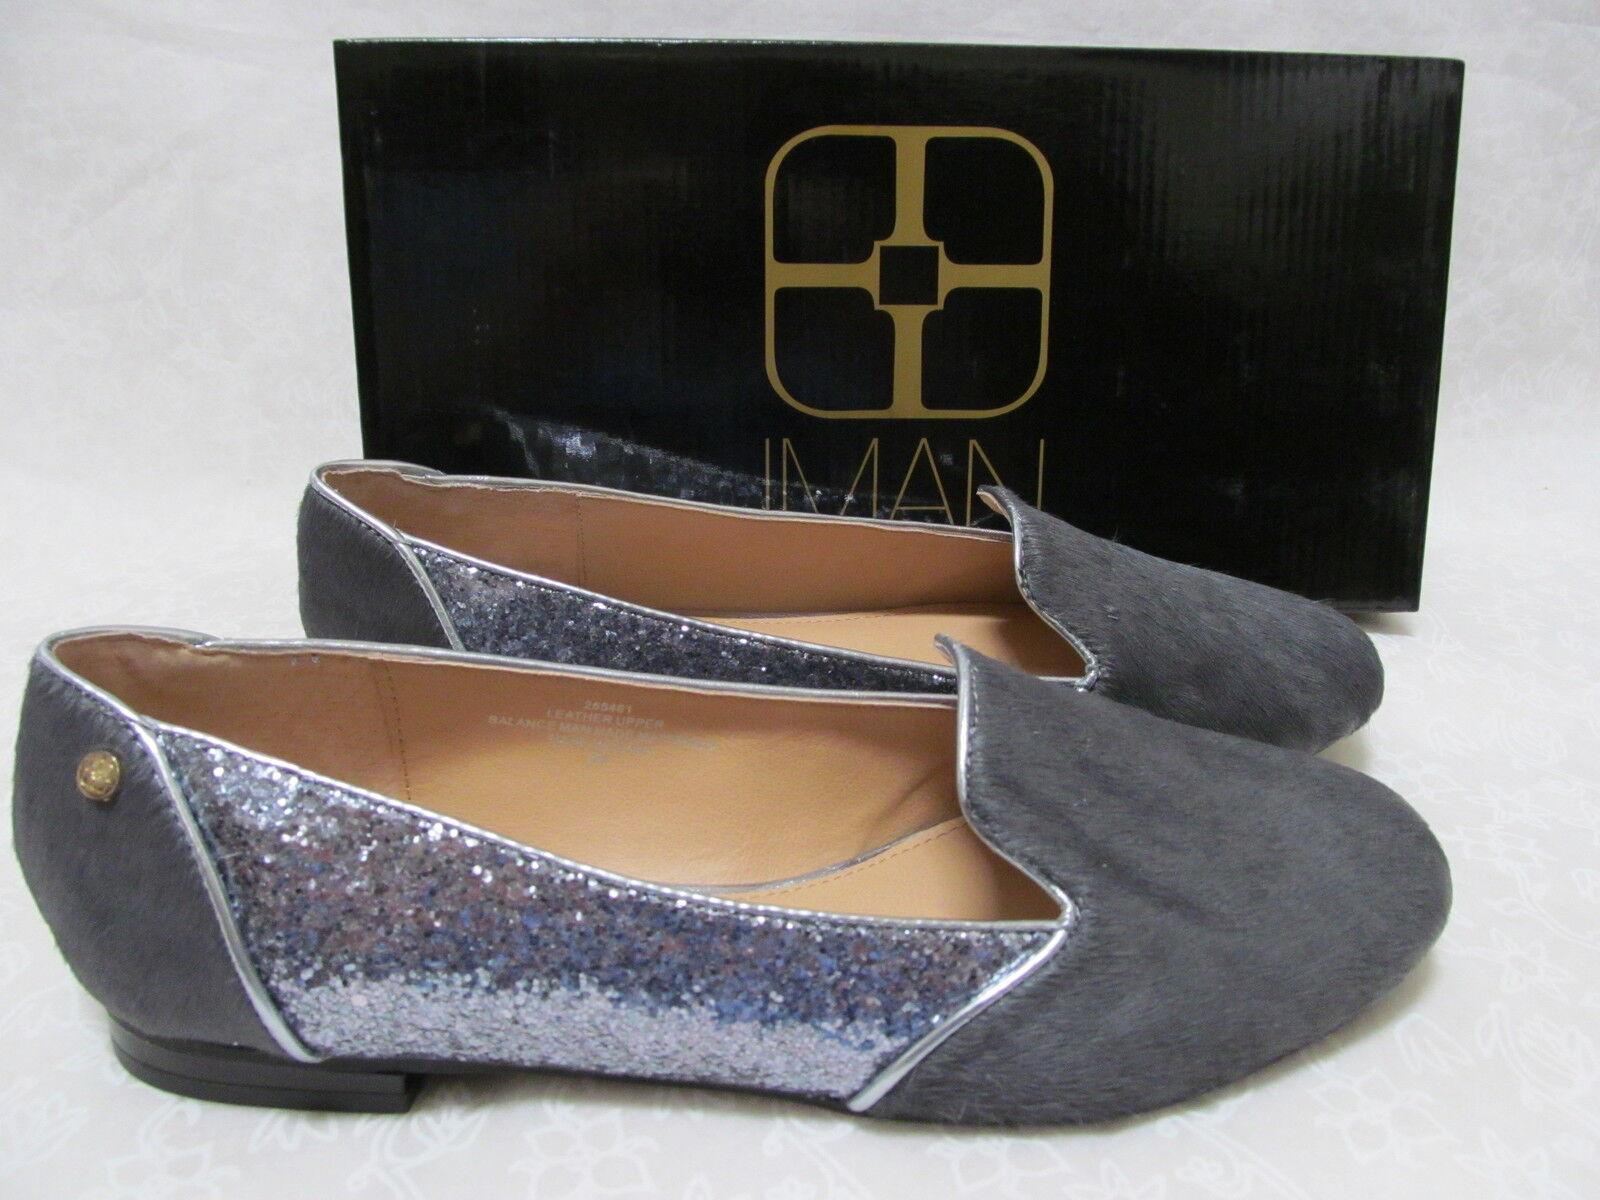 IMAN GRAY LEATHER HAIRCALF & GLITTER Schuhe SIZE 9 1/2 W - NEU